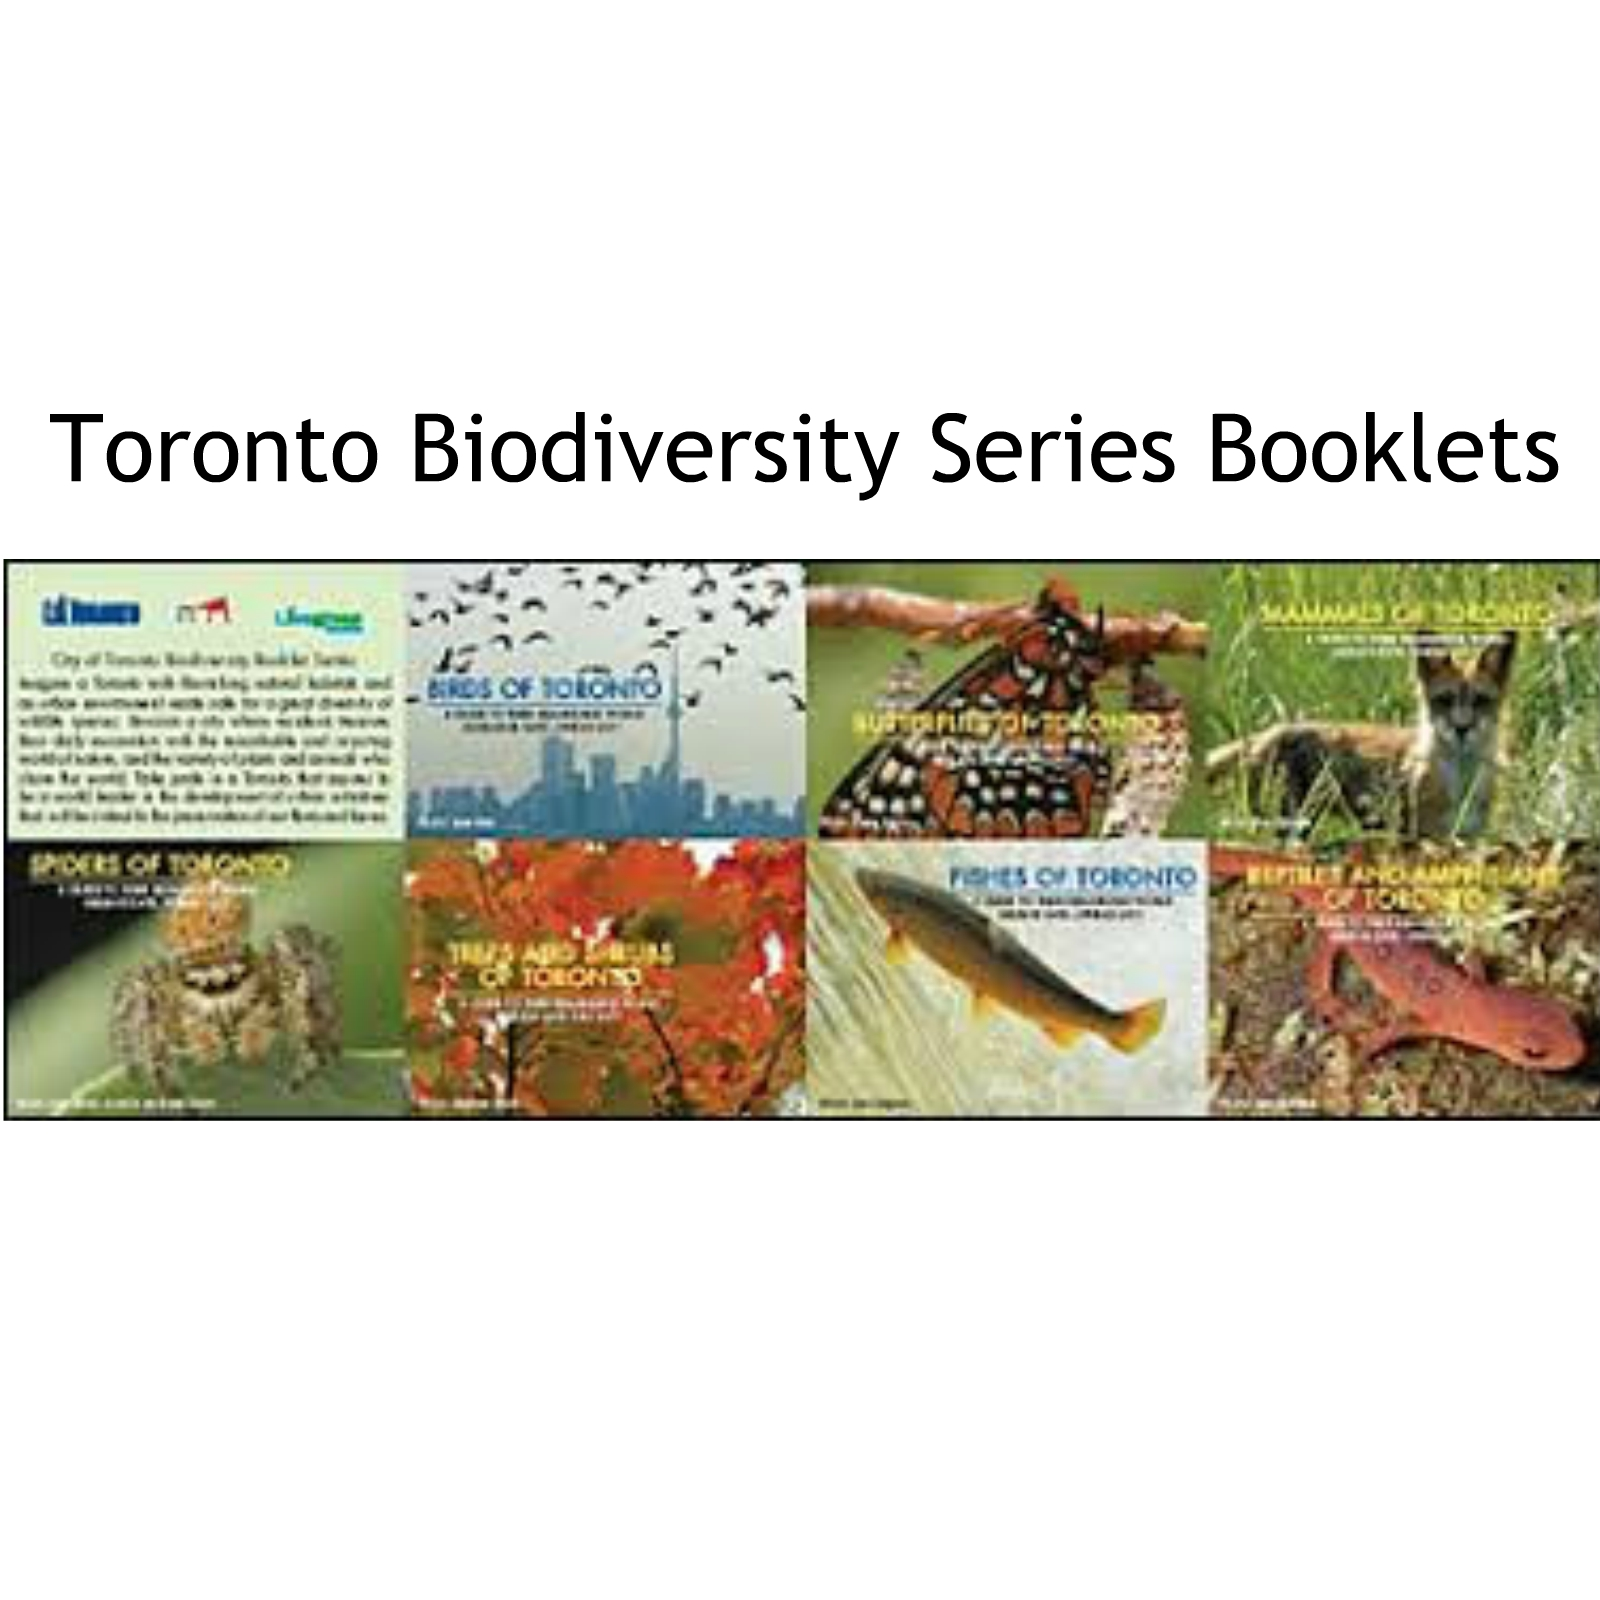 Toronto Biodiversity Series Booklets